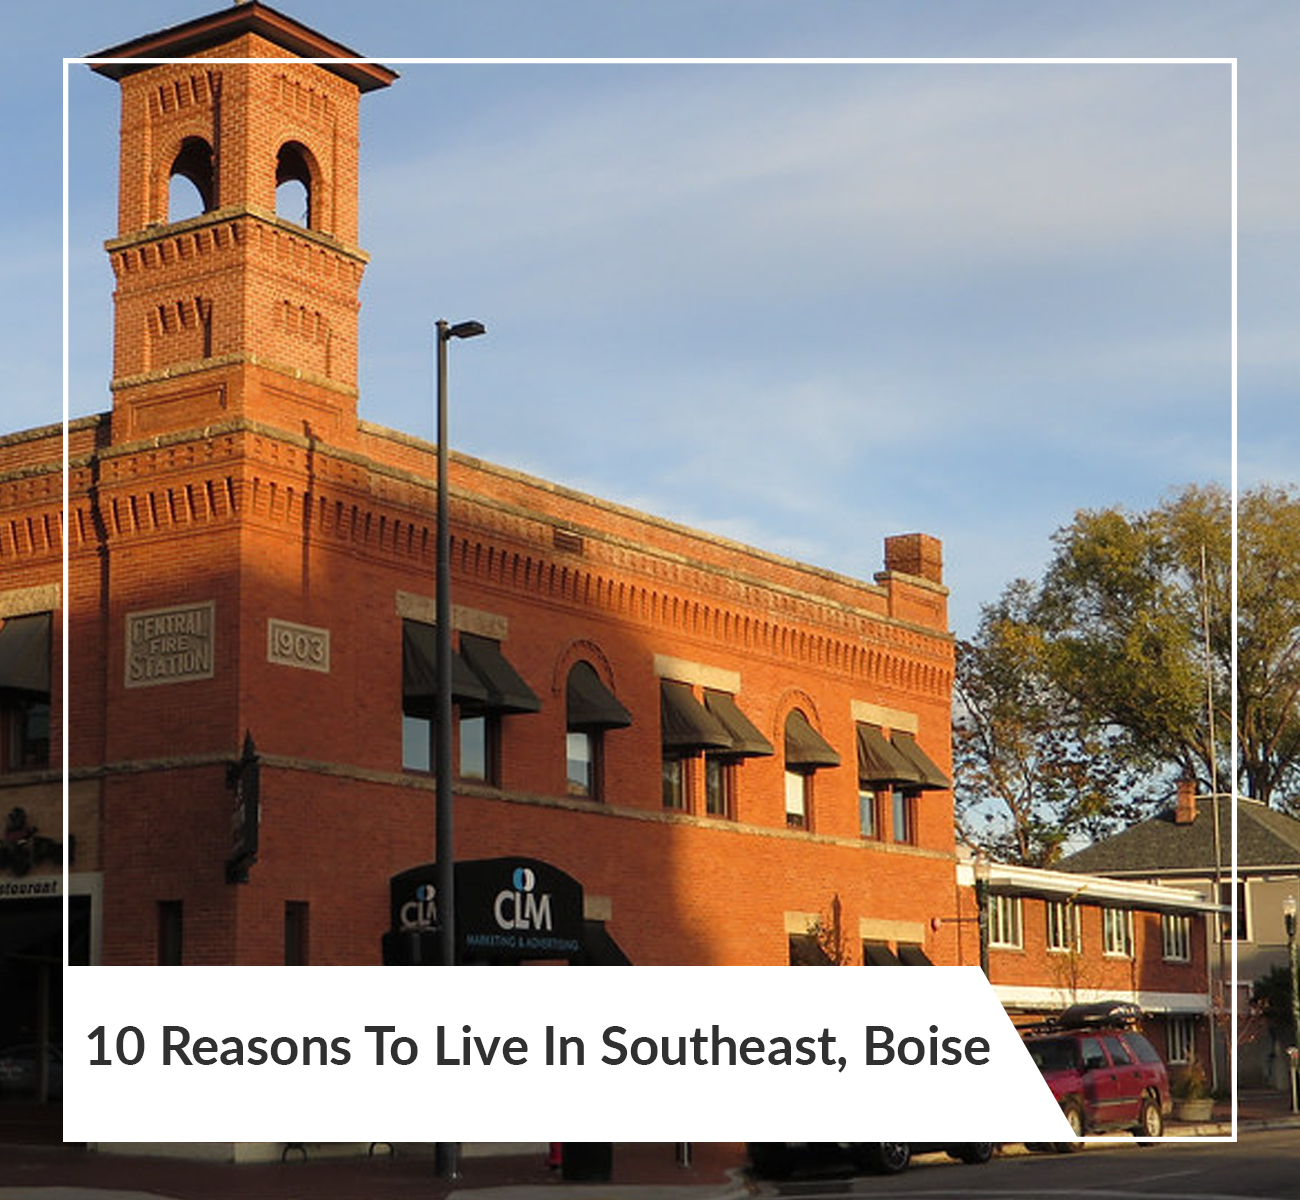 Living in Southeast Boise